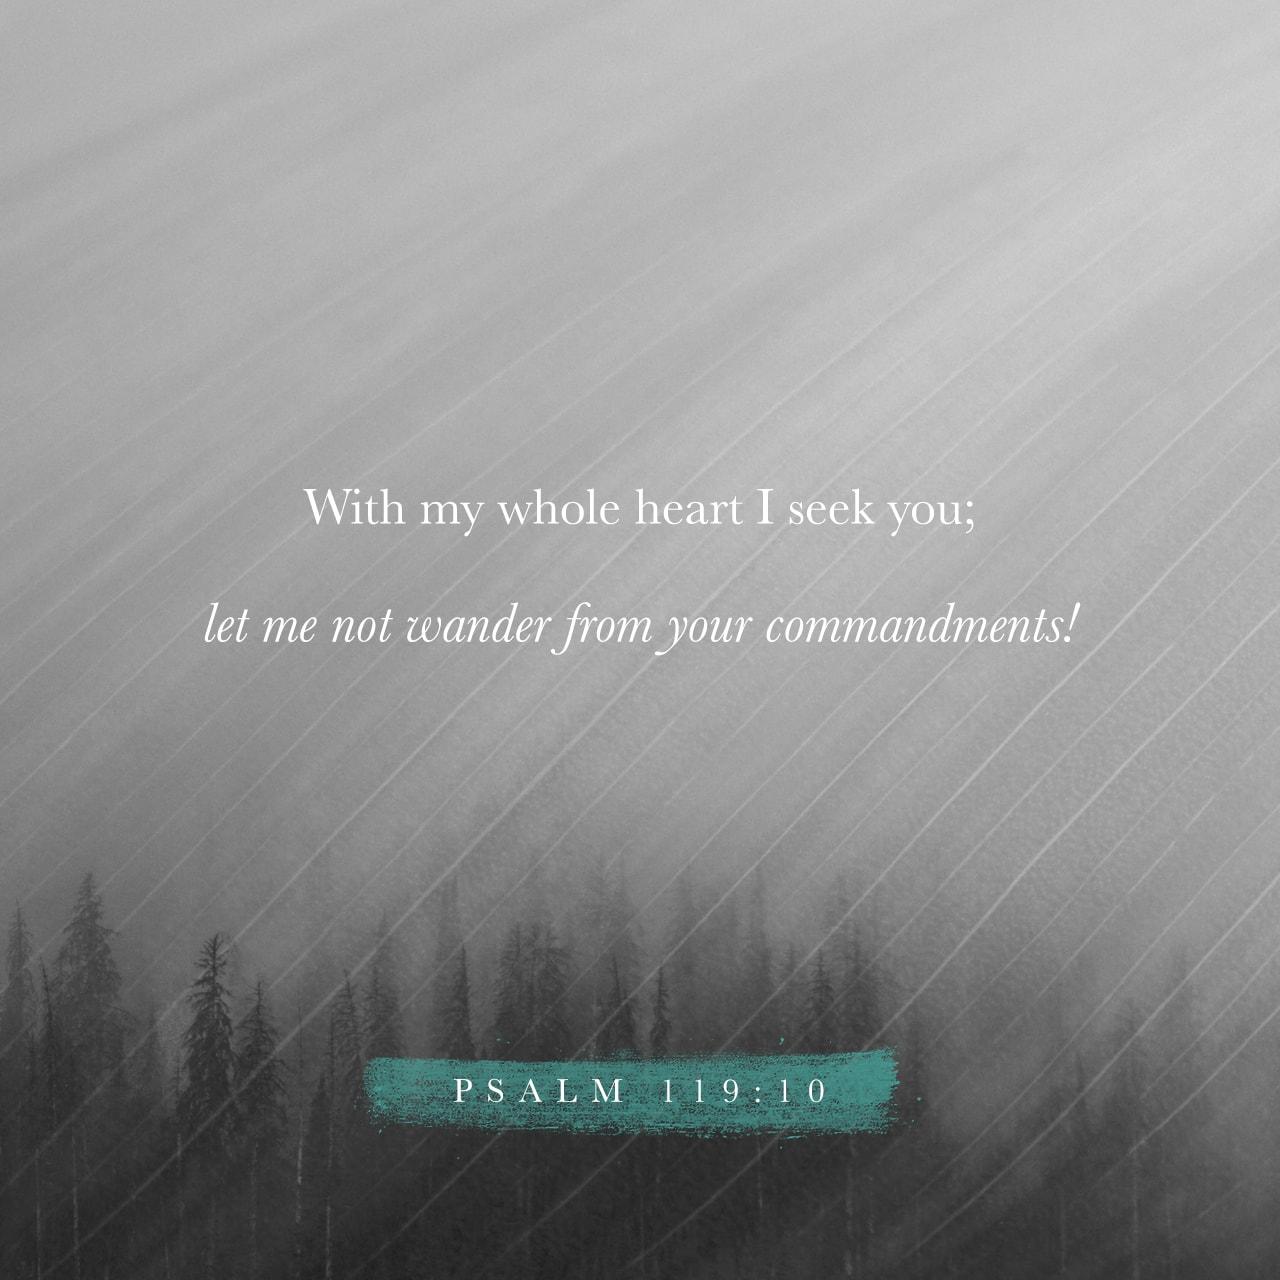 Psalm 119:10